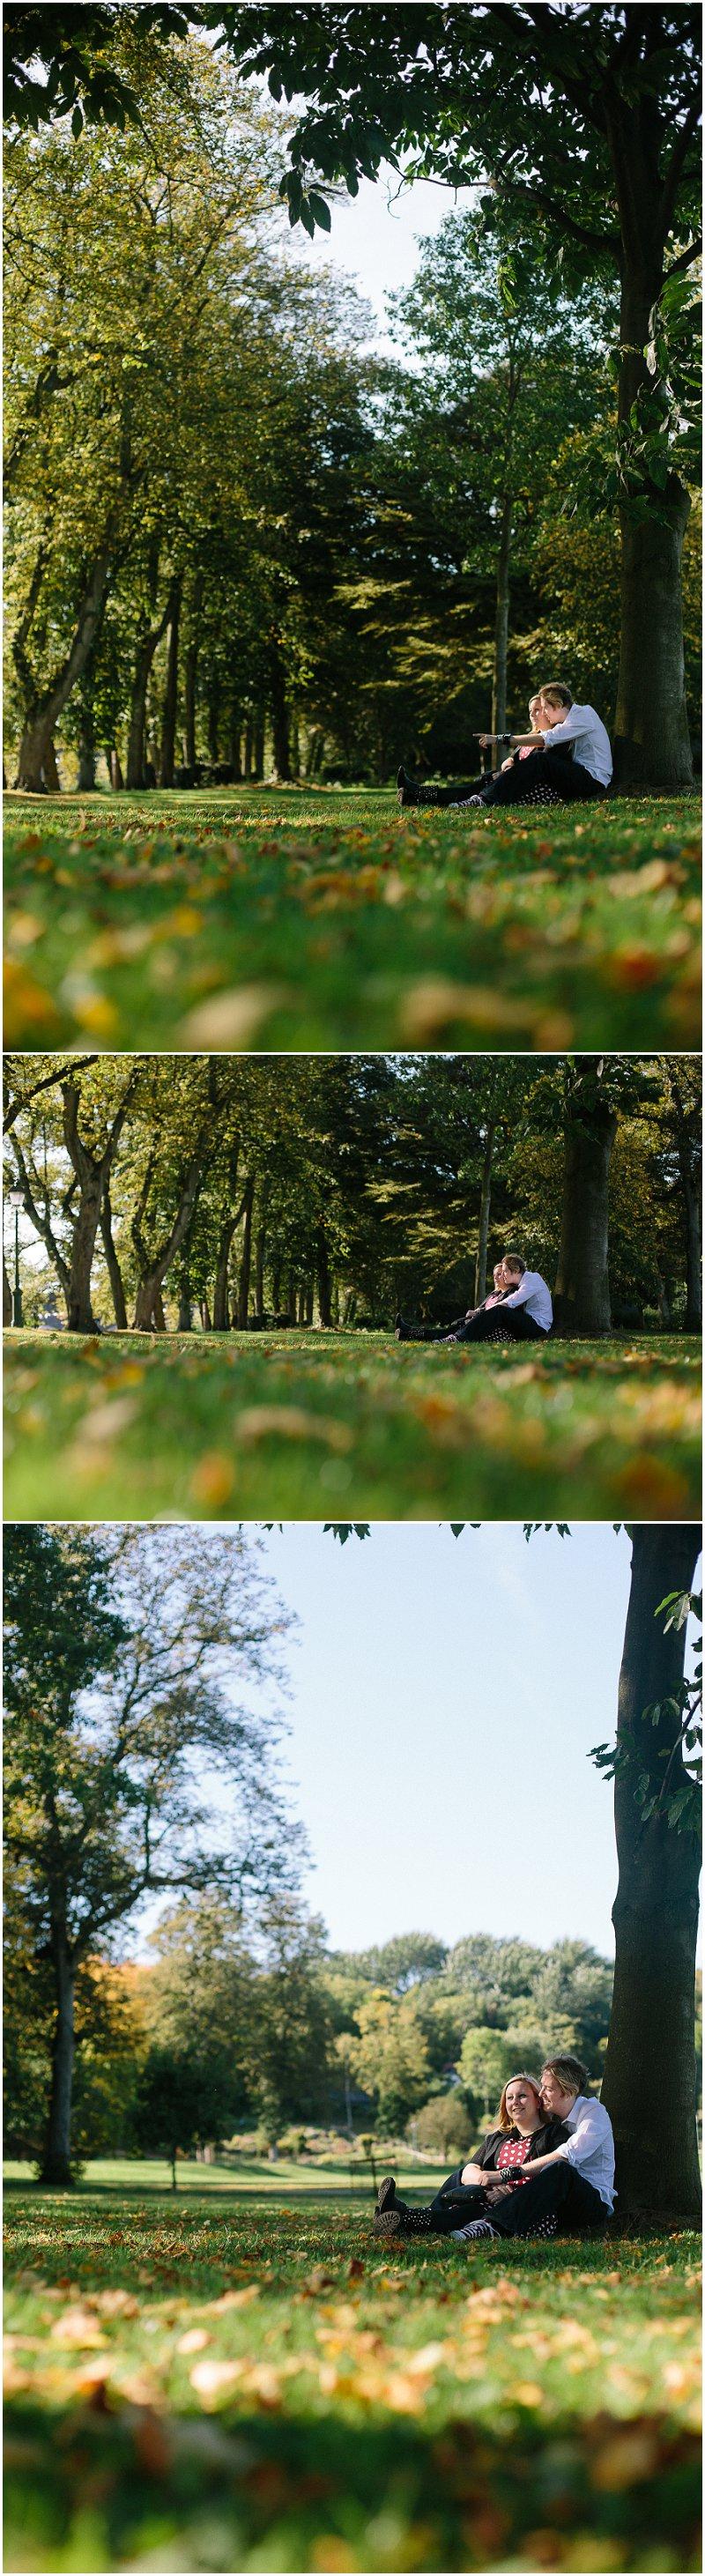 Avenham Park Photographer | Engagement Photography